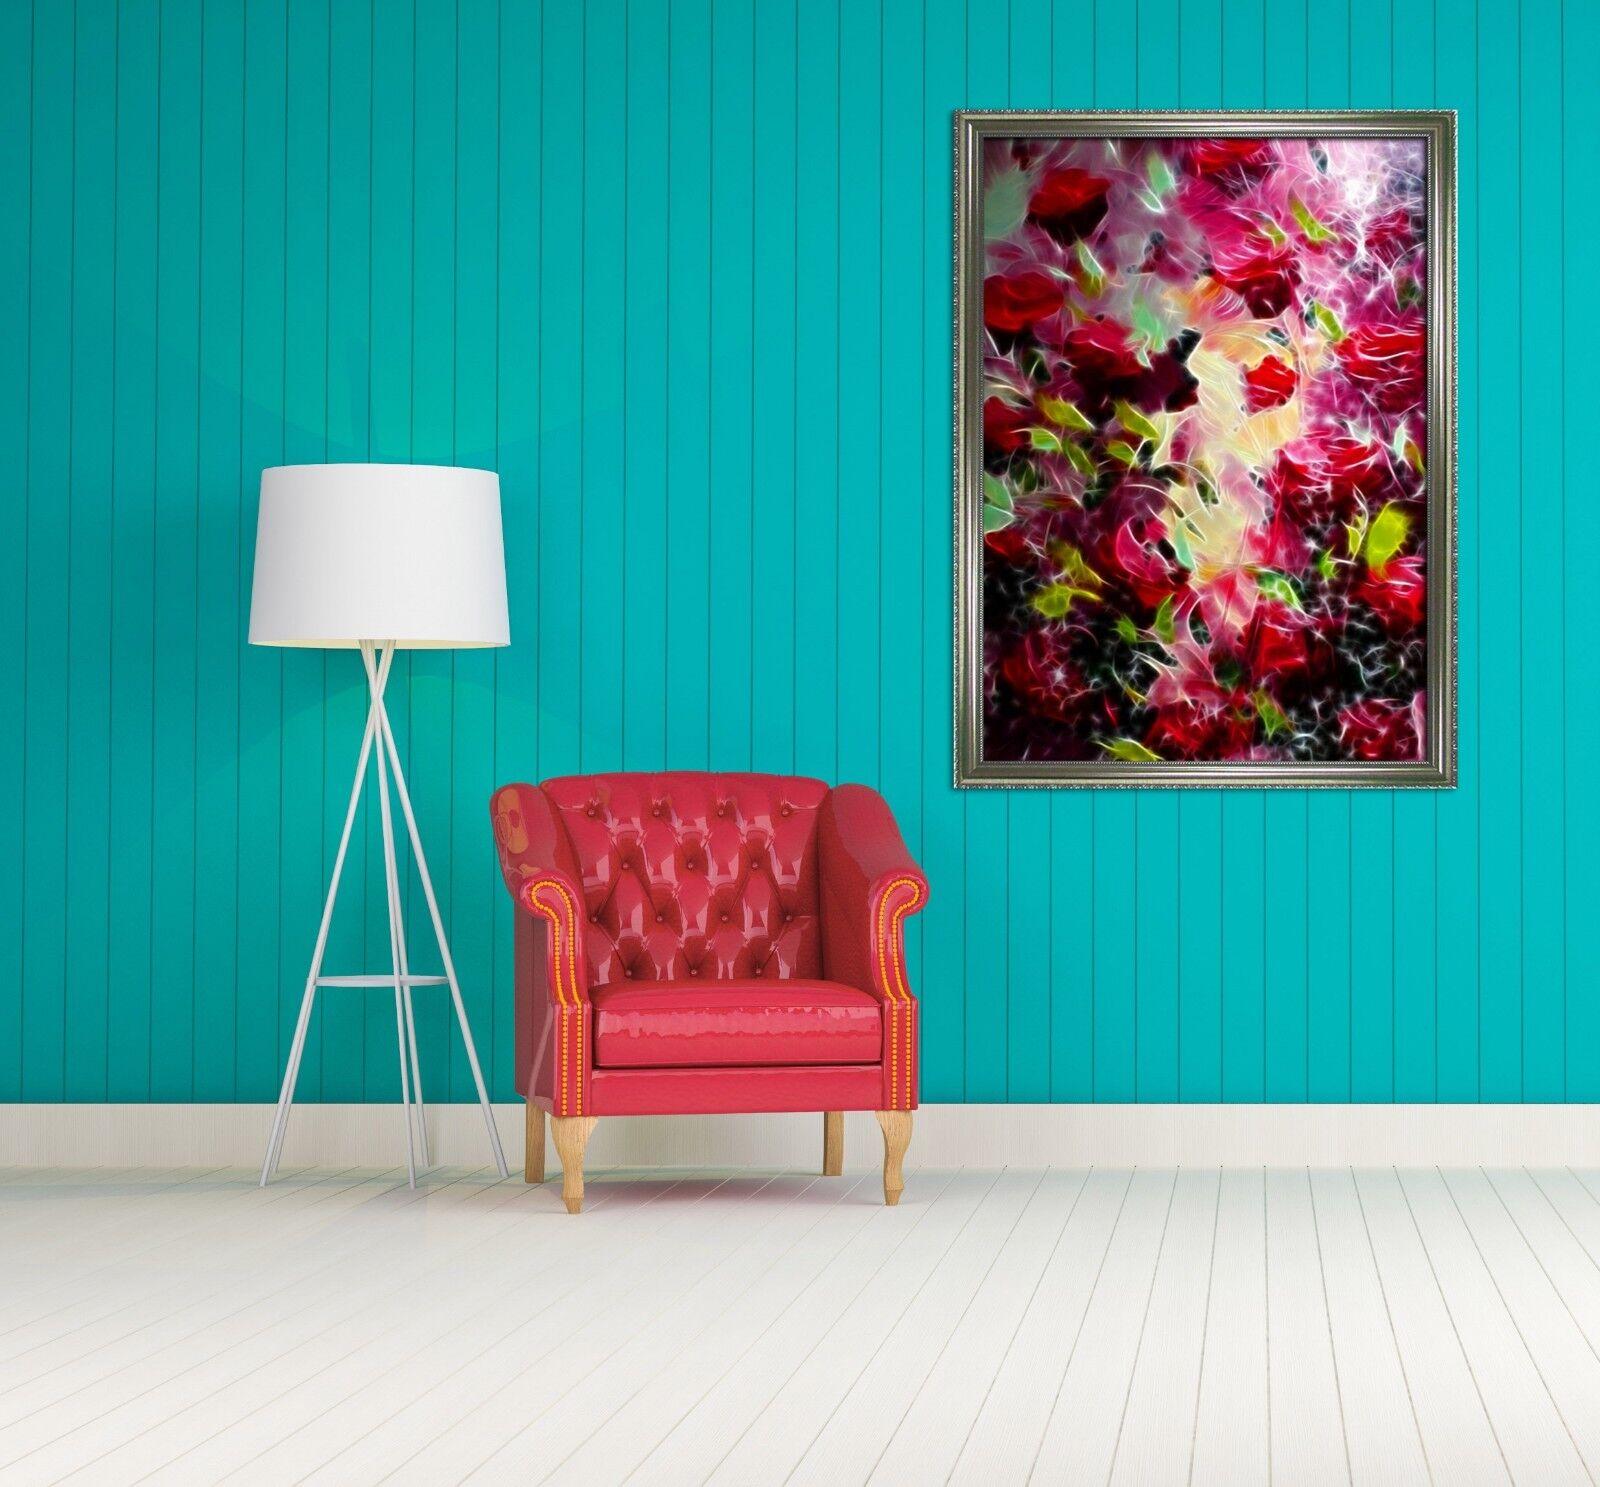 3D Póster Enmarcado abstracta cártamo 69 Decoración del Hogar Pintura de Impresión Arte AJ